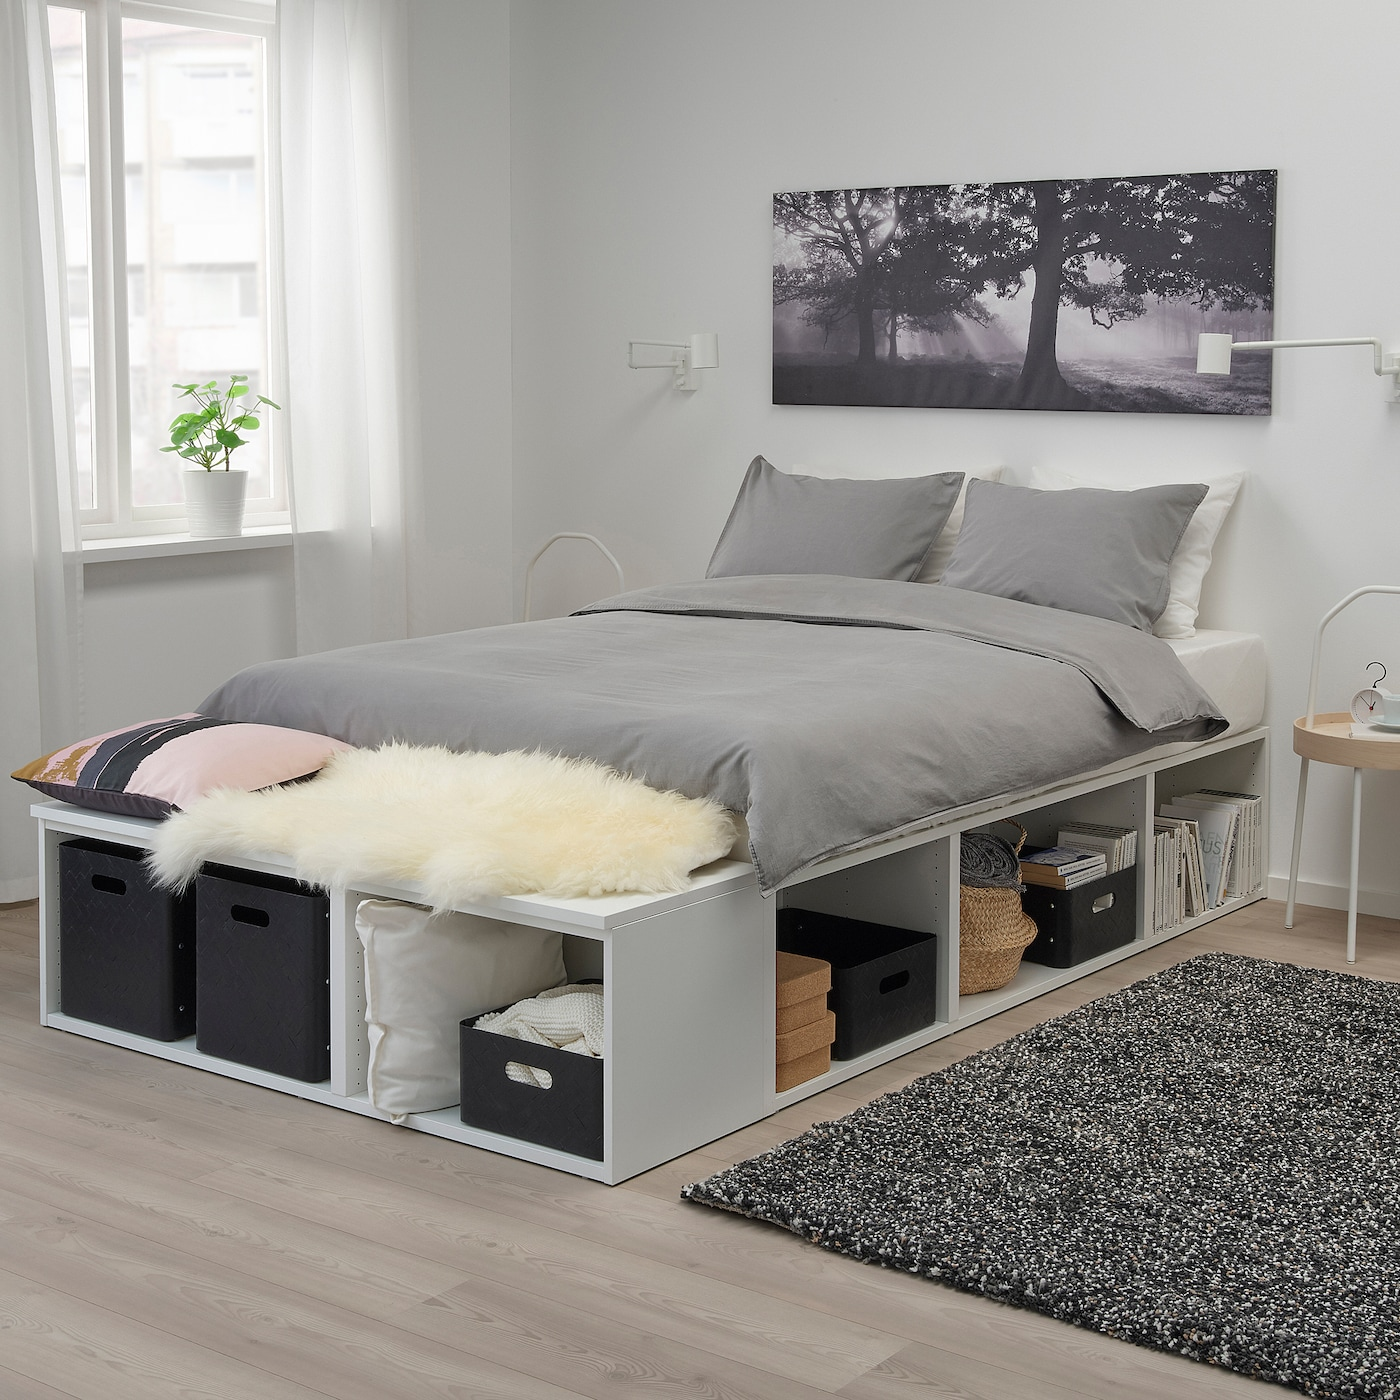 Platsa Bettgestell Mit Aufbewahrung Weiss In Den Warenkorb Legen Ikea Deutschland